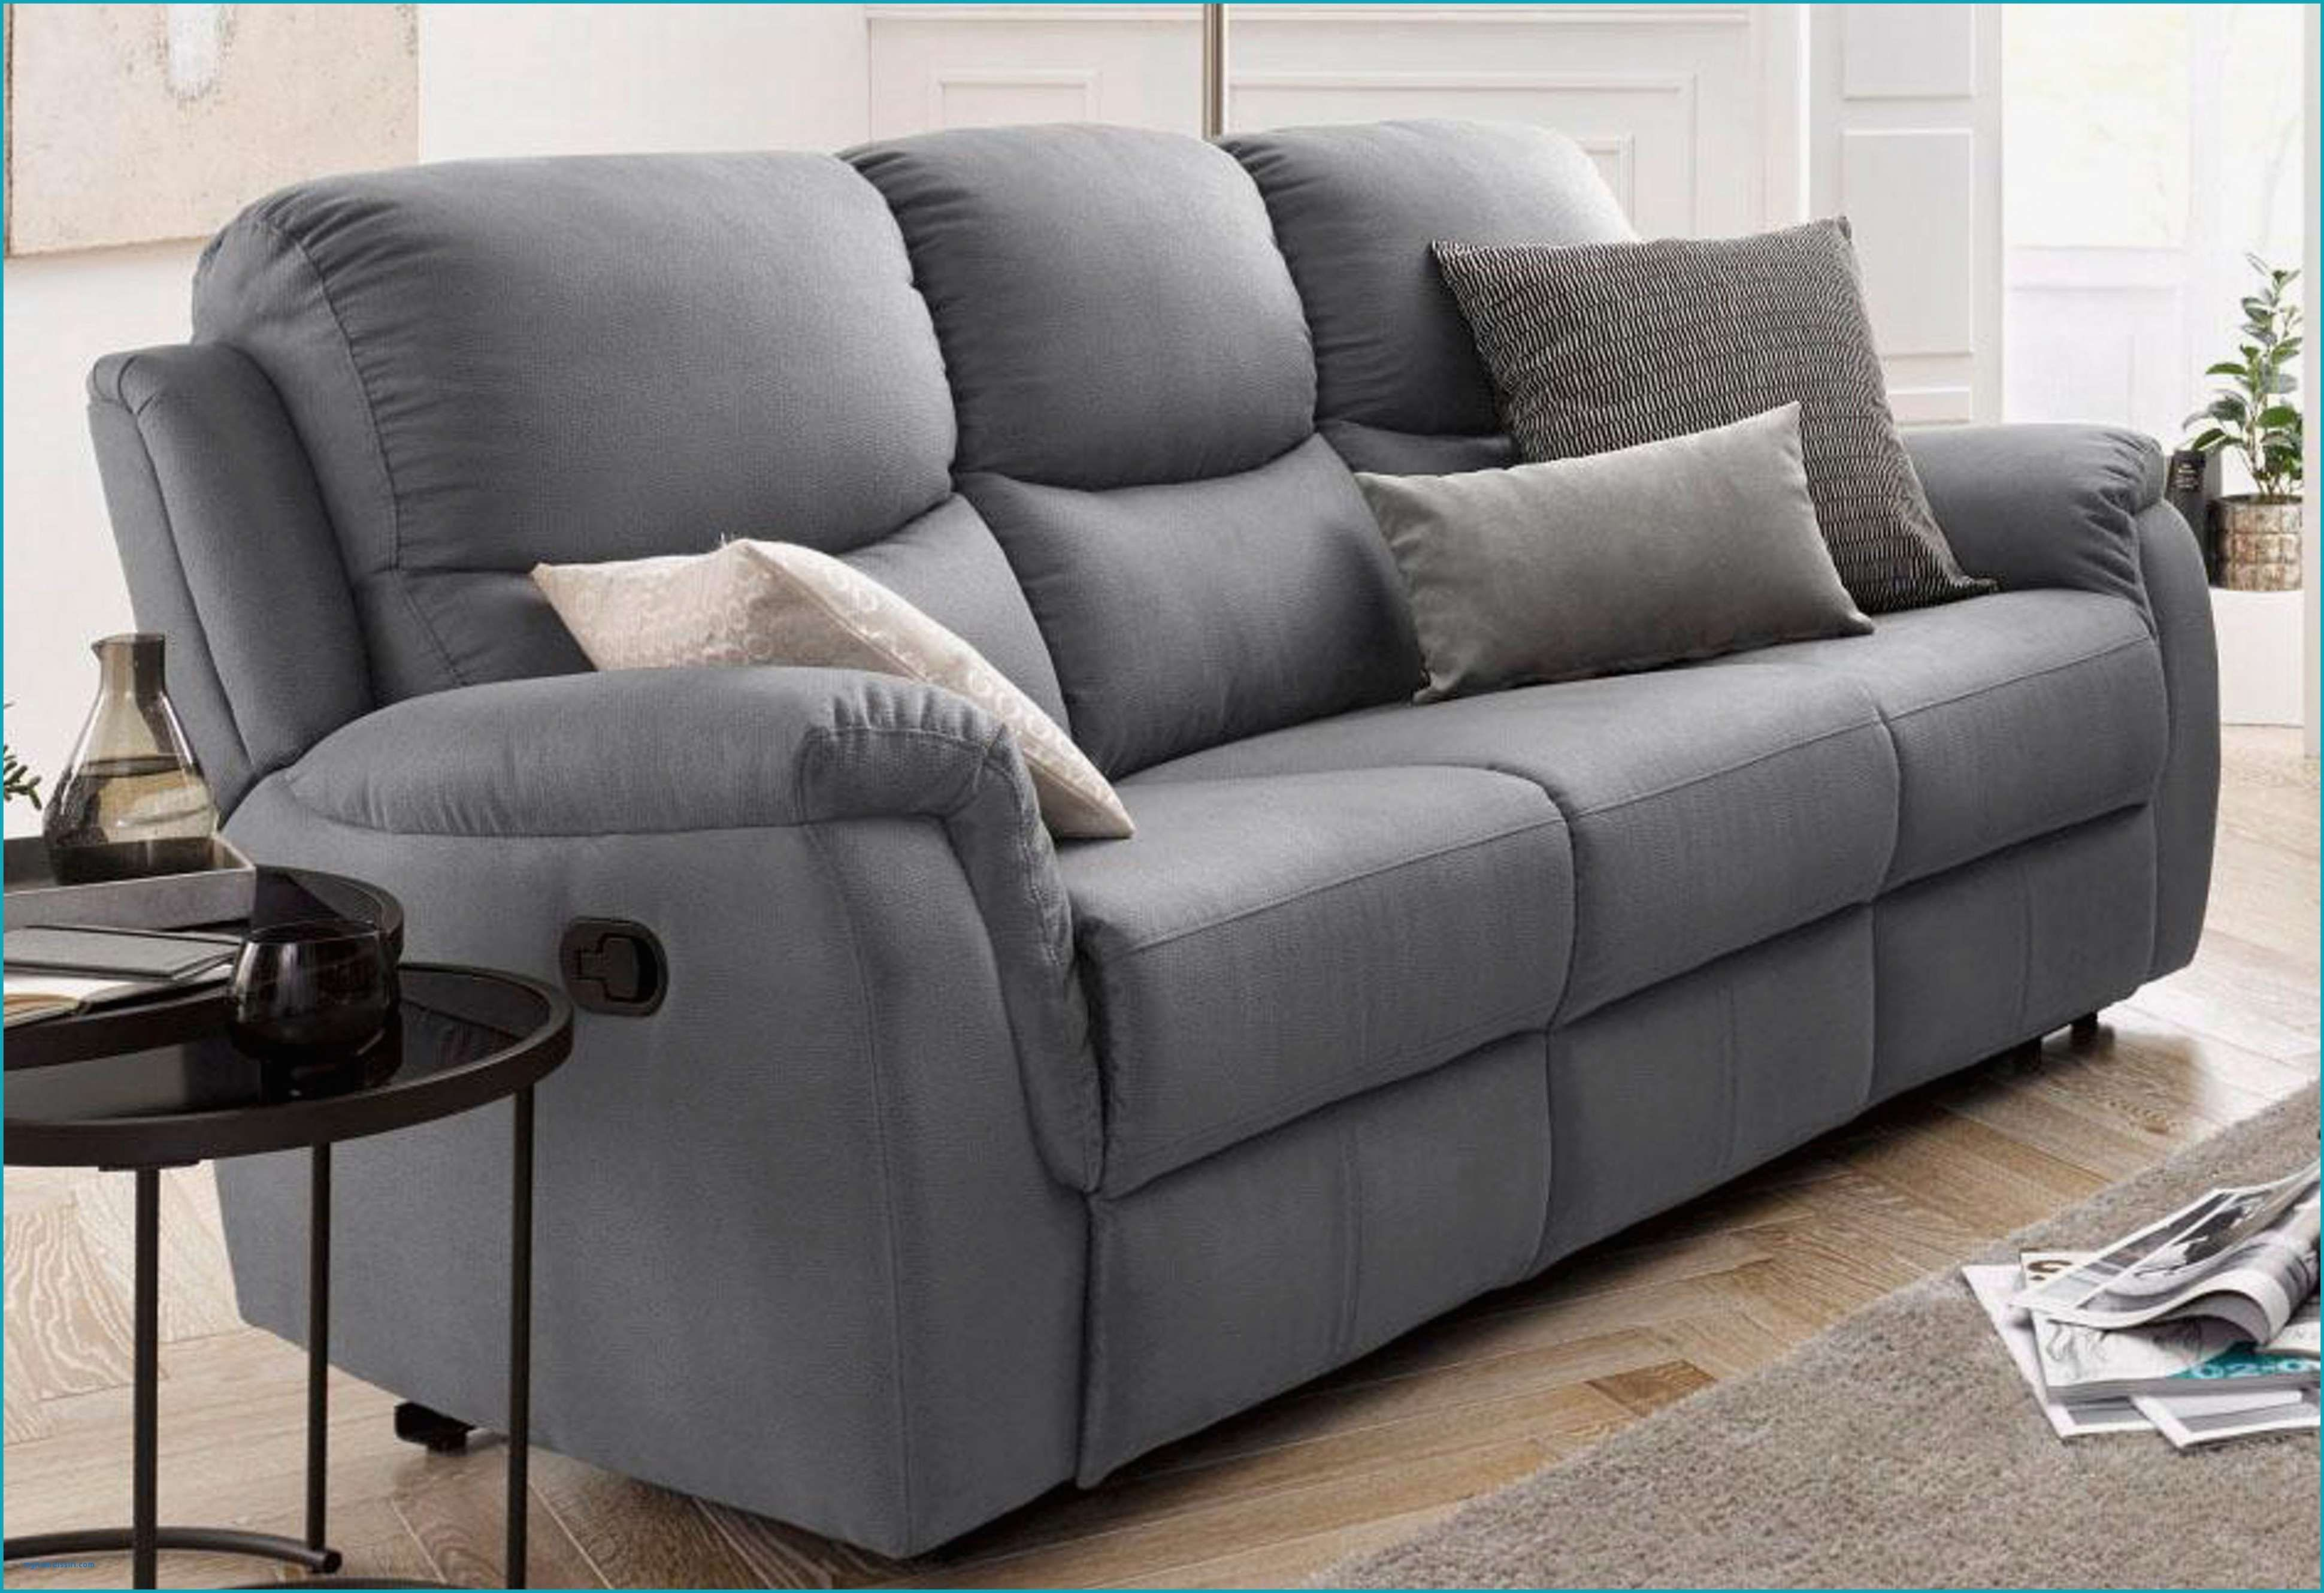 Ecksofa Kaufen Gunstig Sofa Relaxfunktion Gunstig Yct Projekte